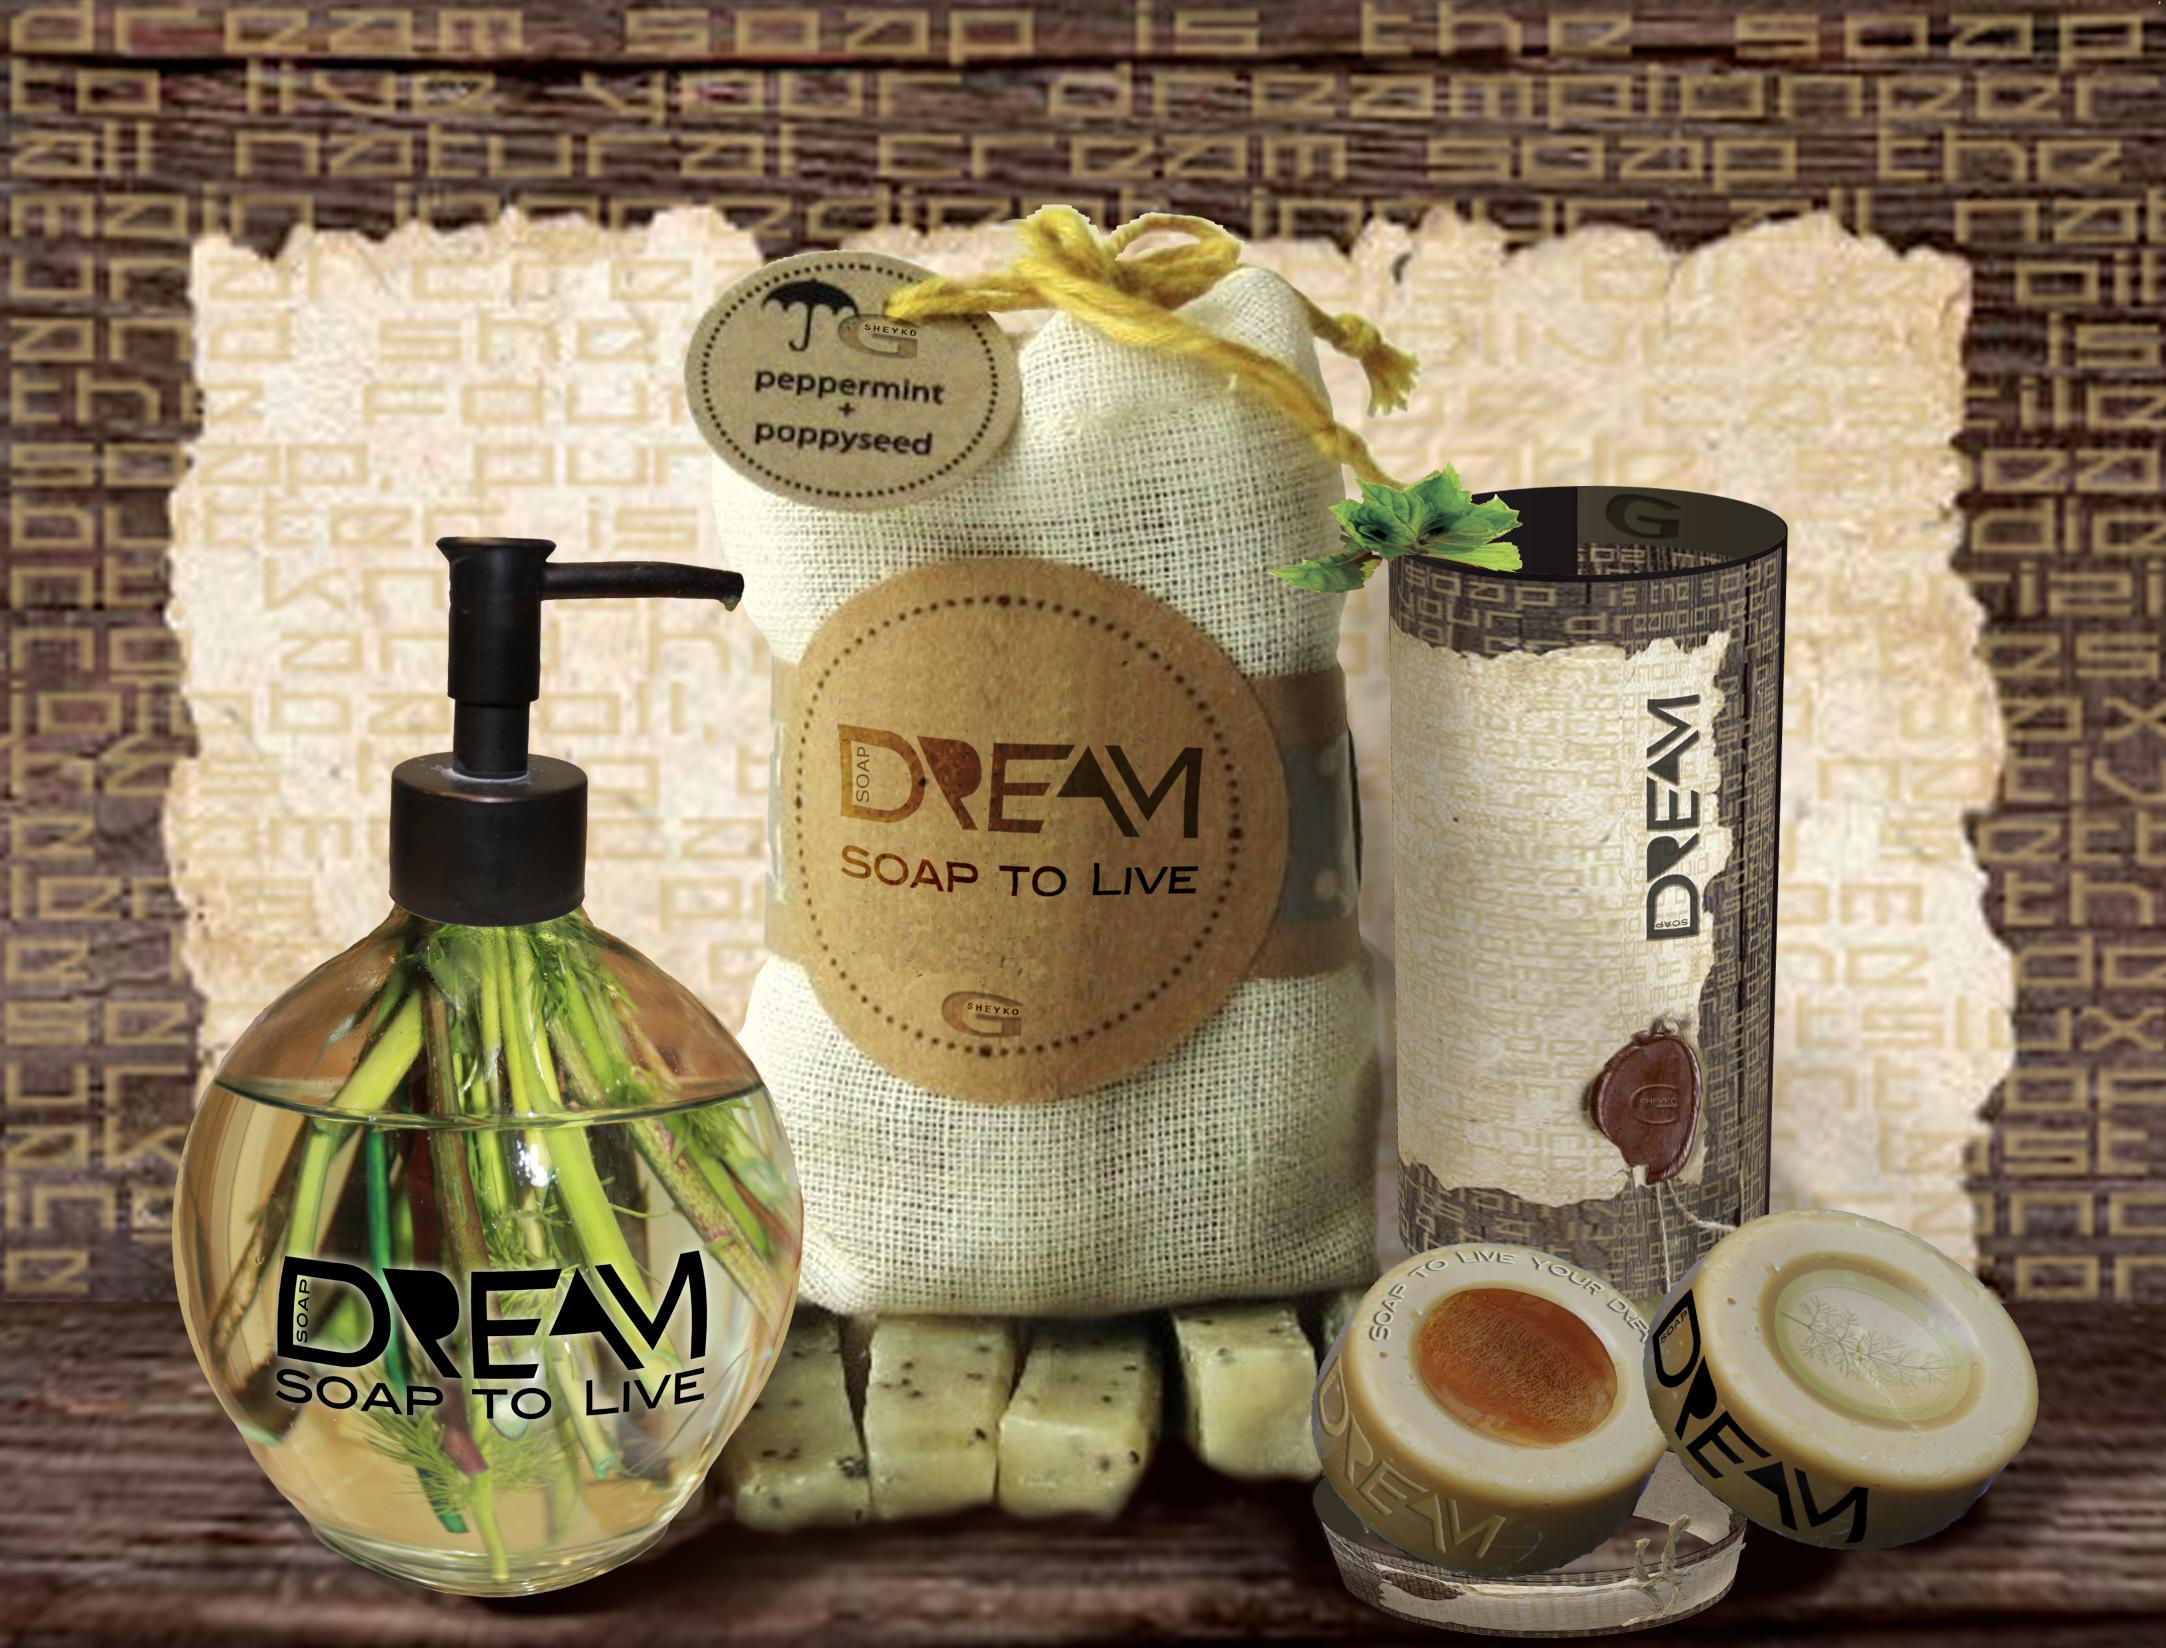 Promotion branding DREAM soap by Ganna Sheyko / Anna Art Design